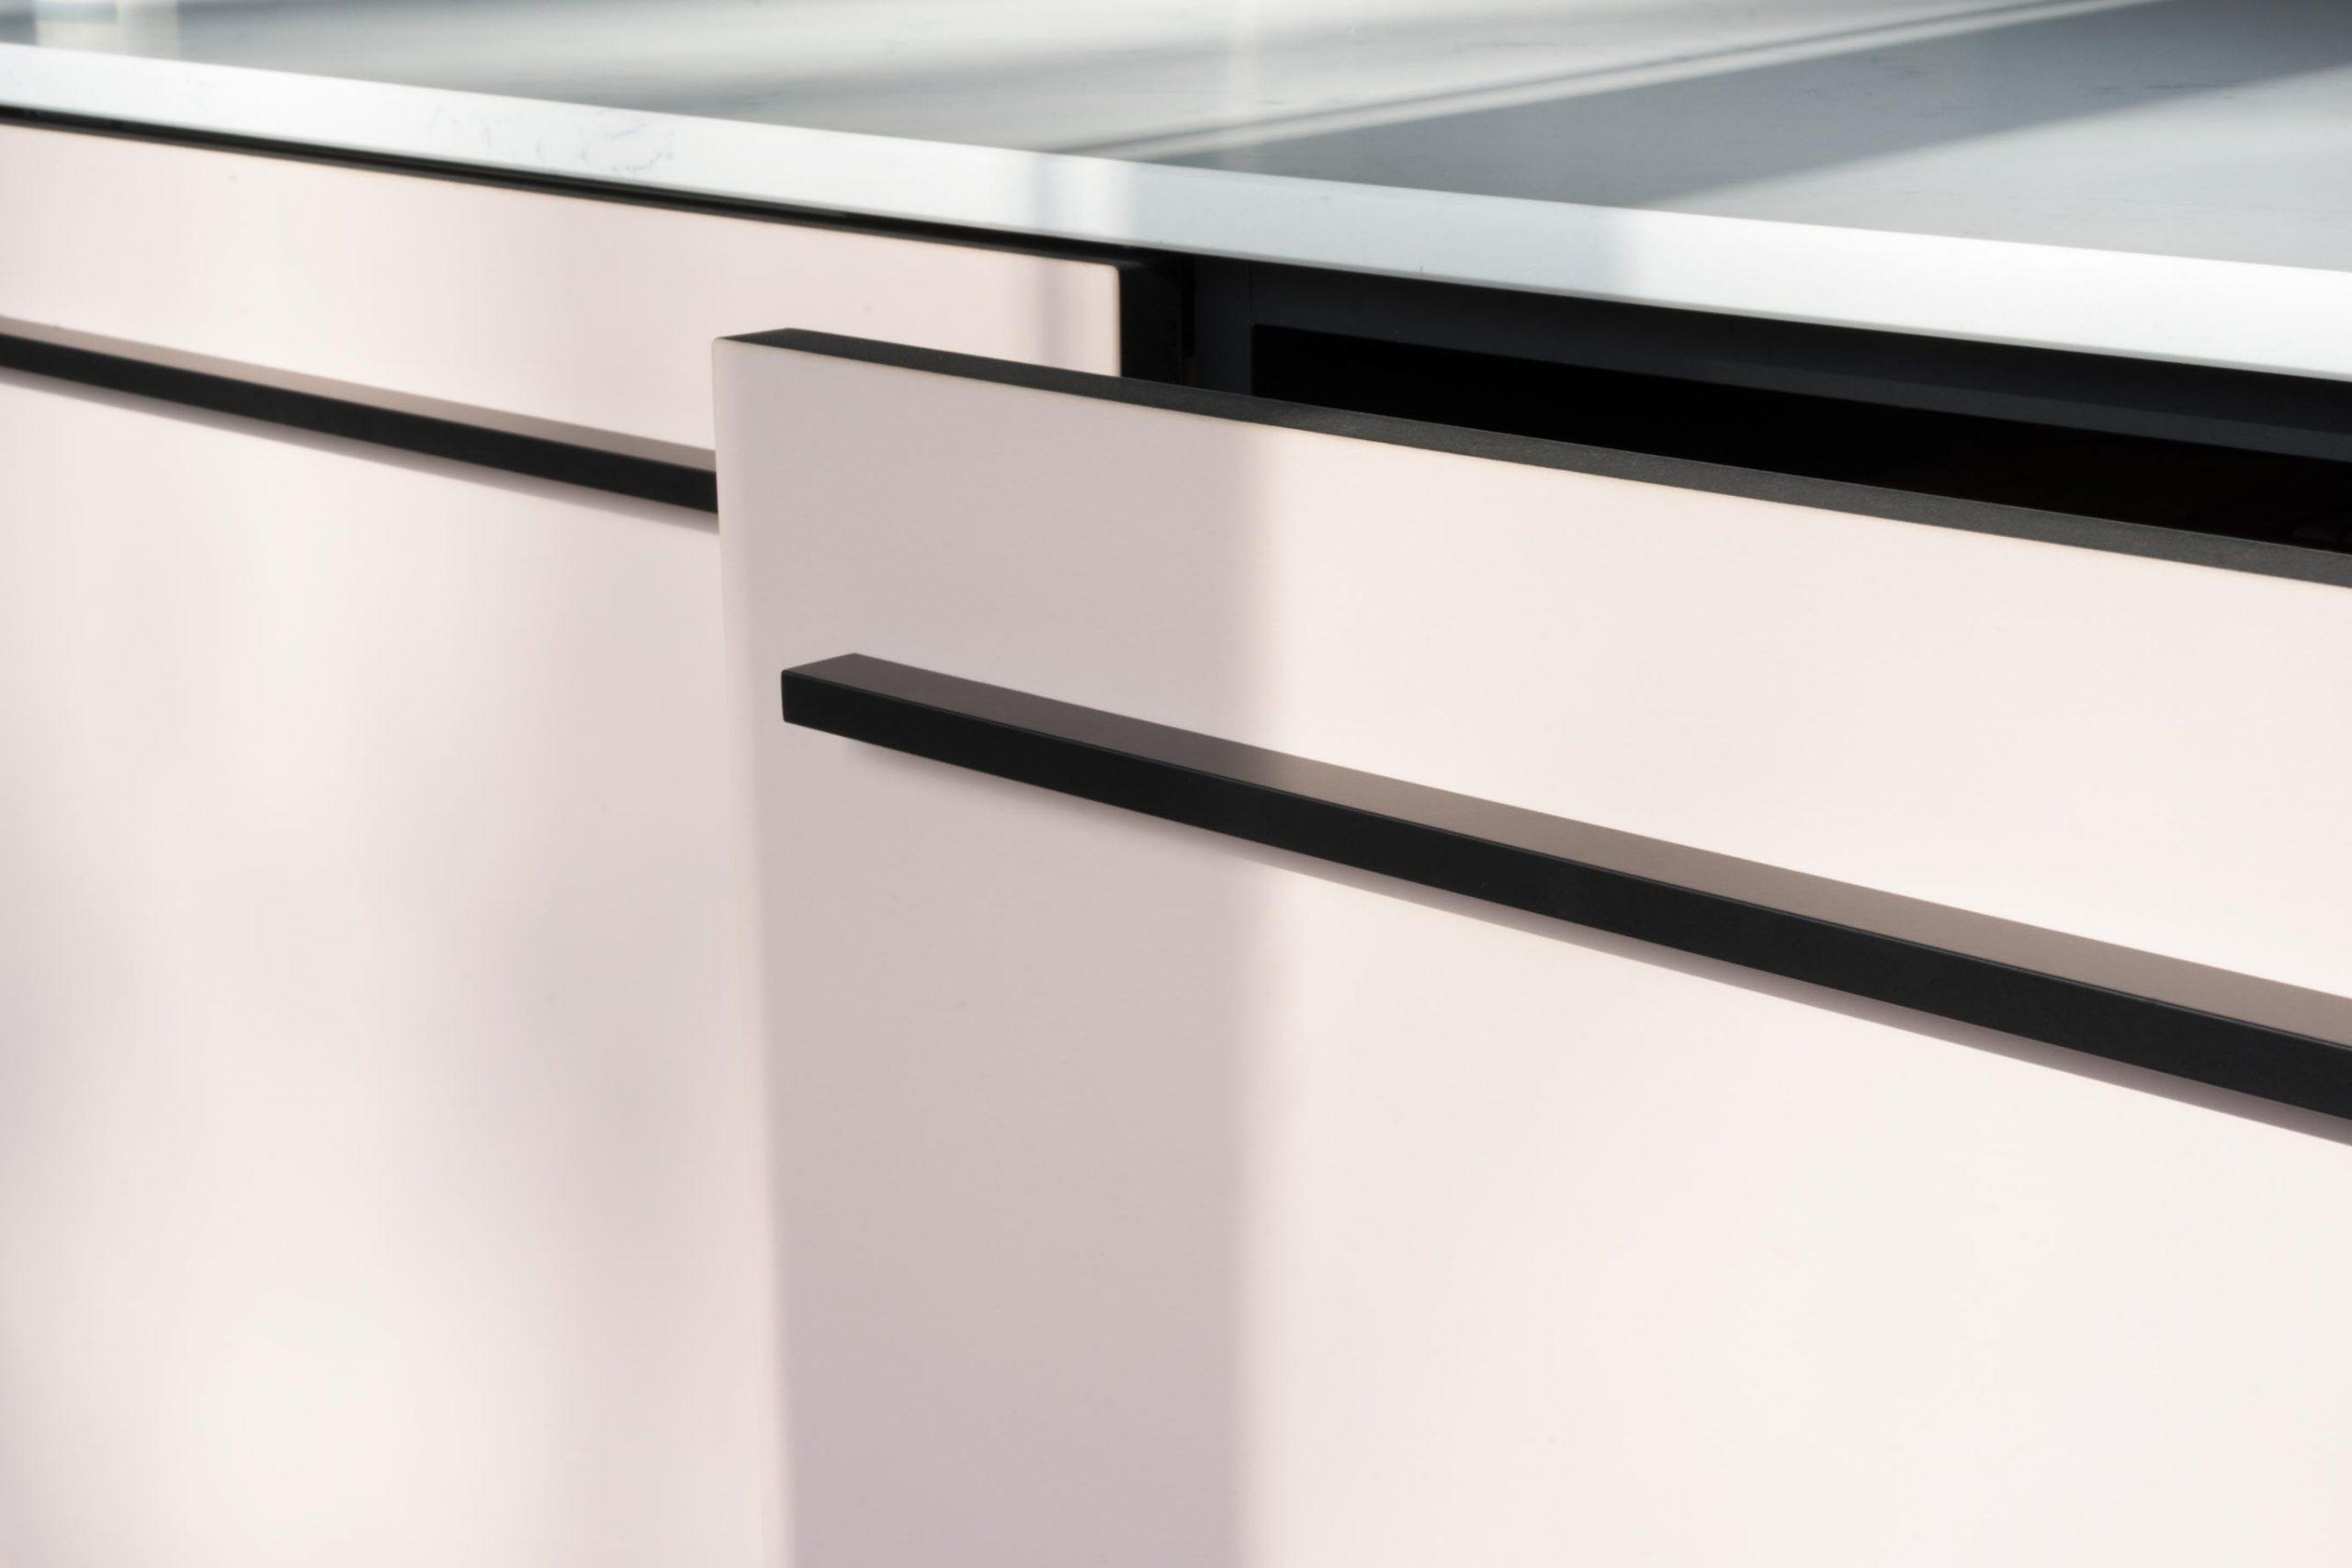 Black thin grips on light pink linoleum fronts